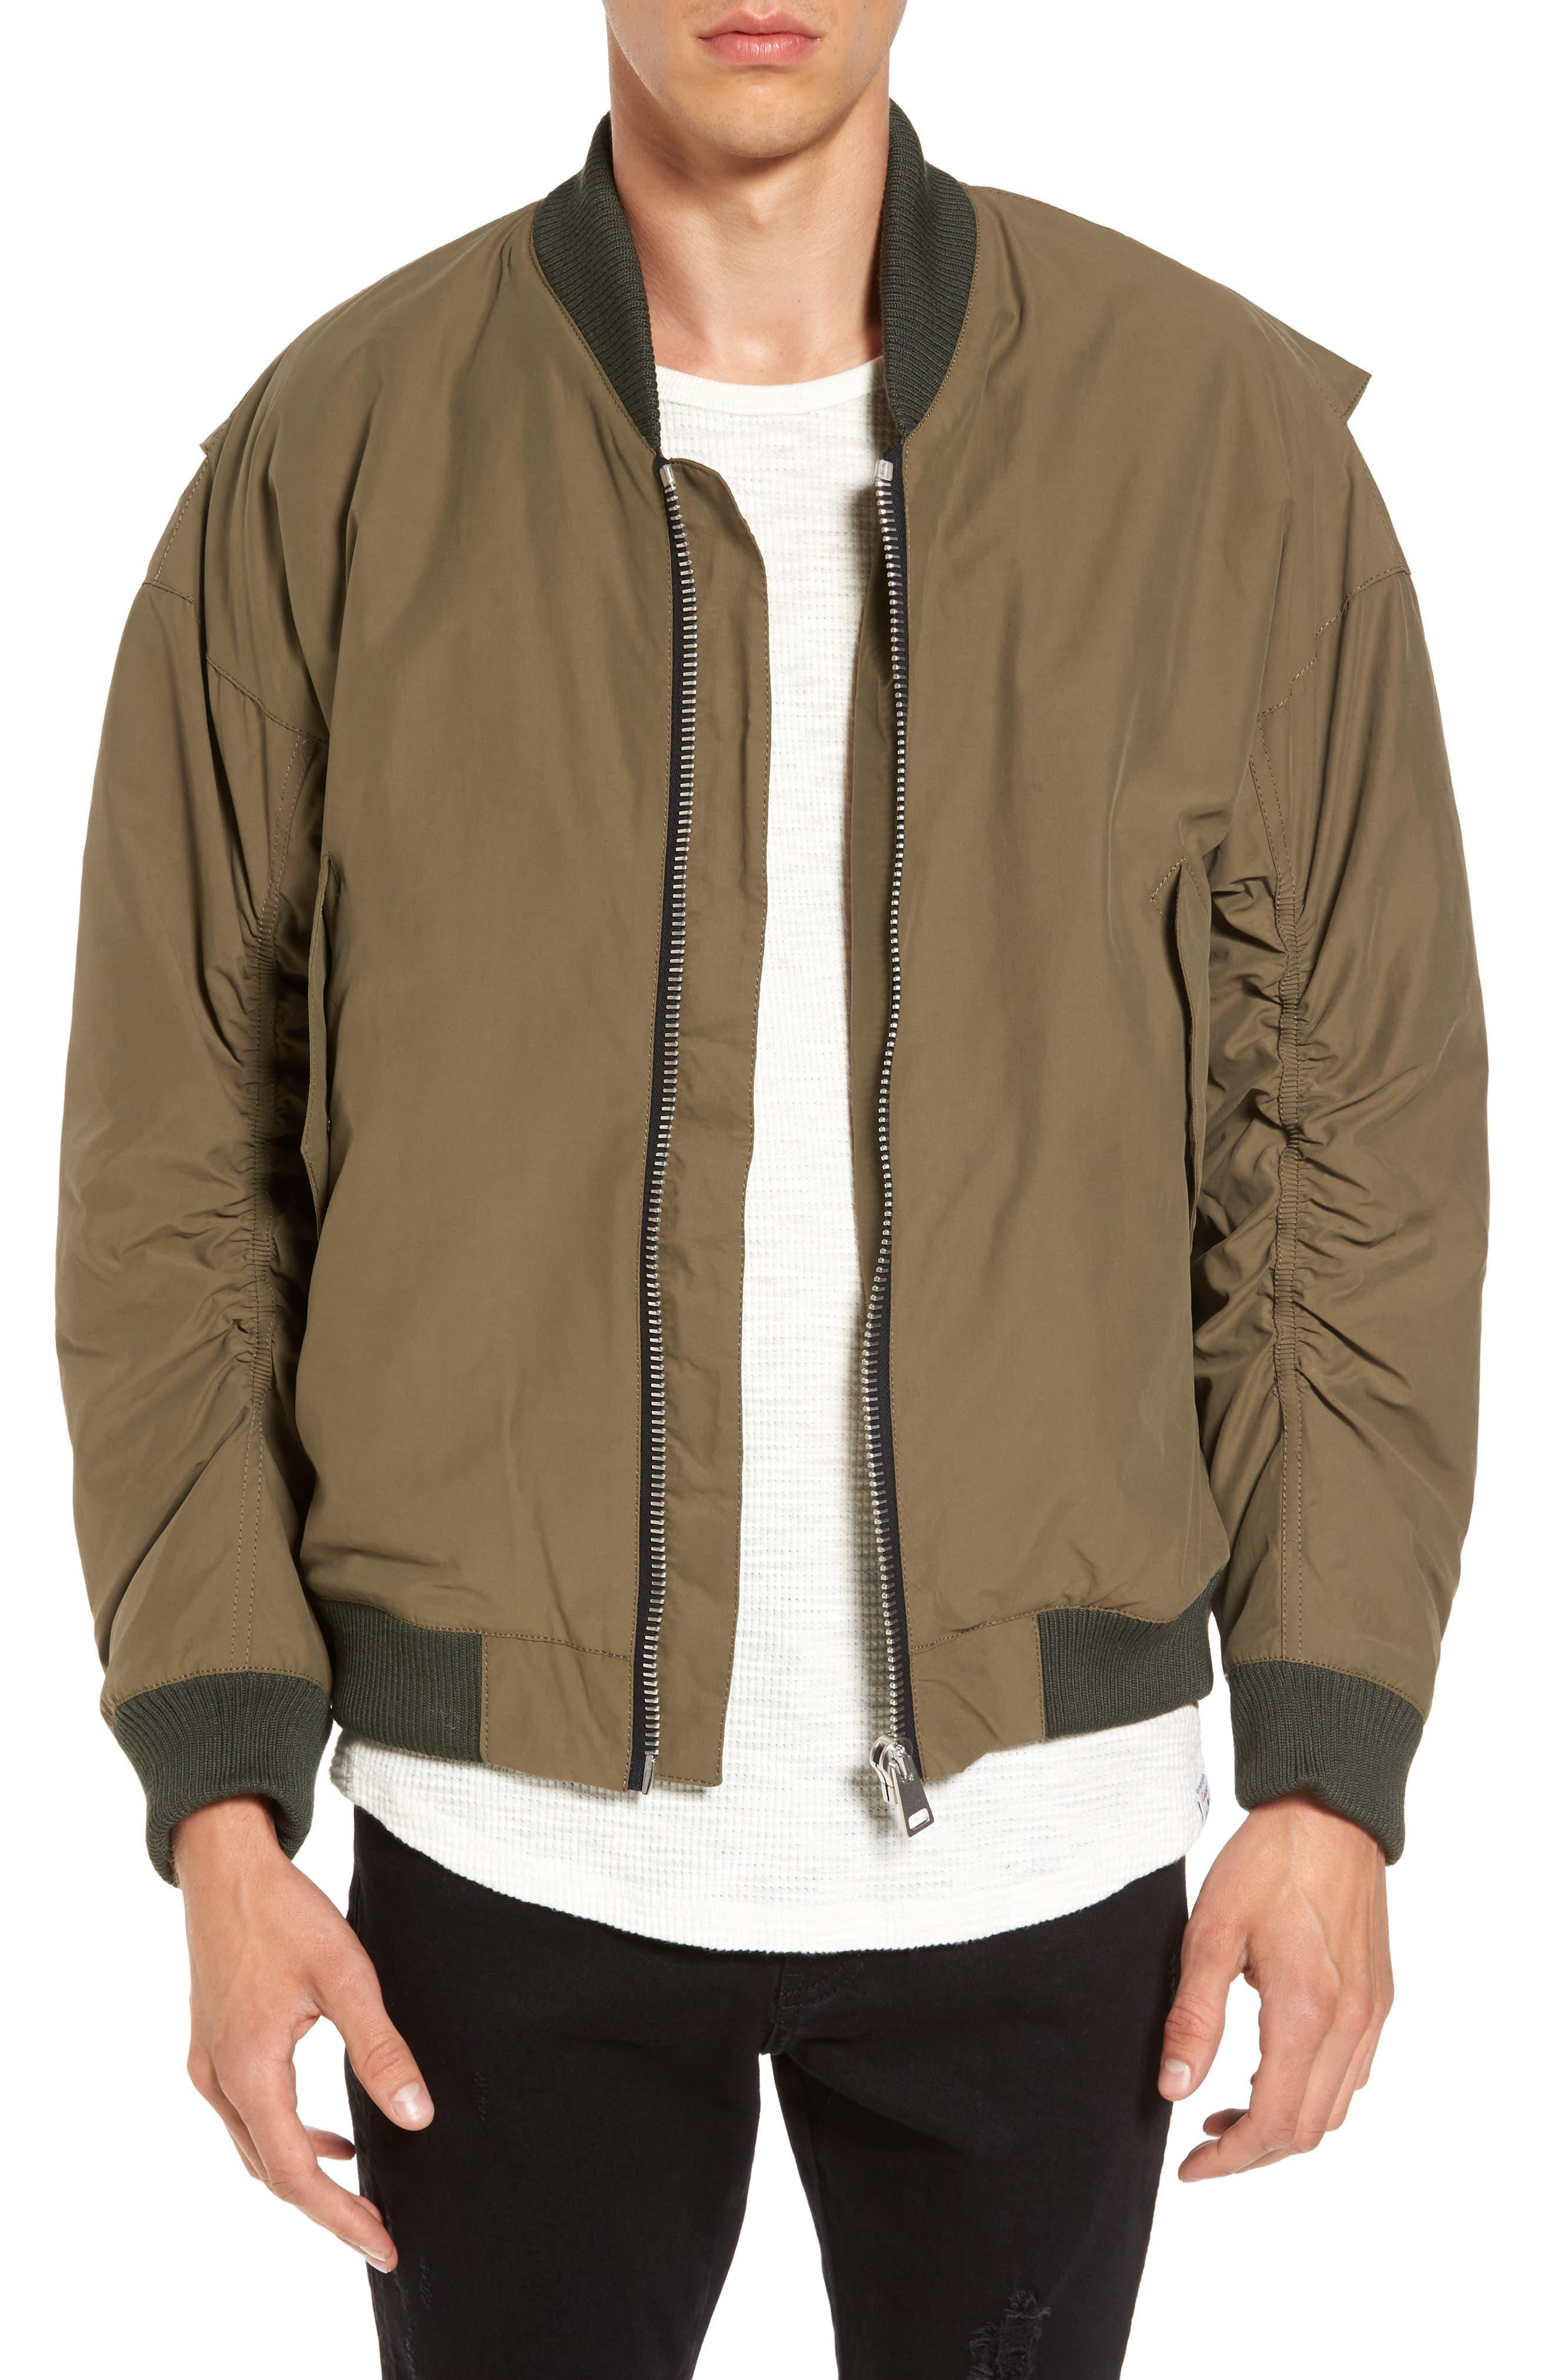 Represent Classic Bomber Jacket